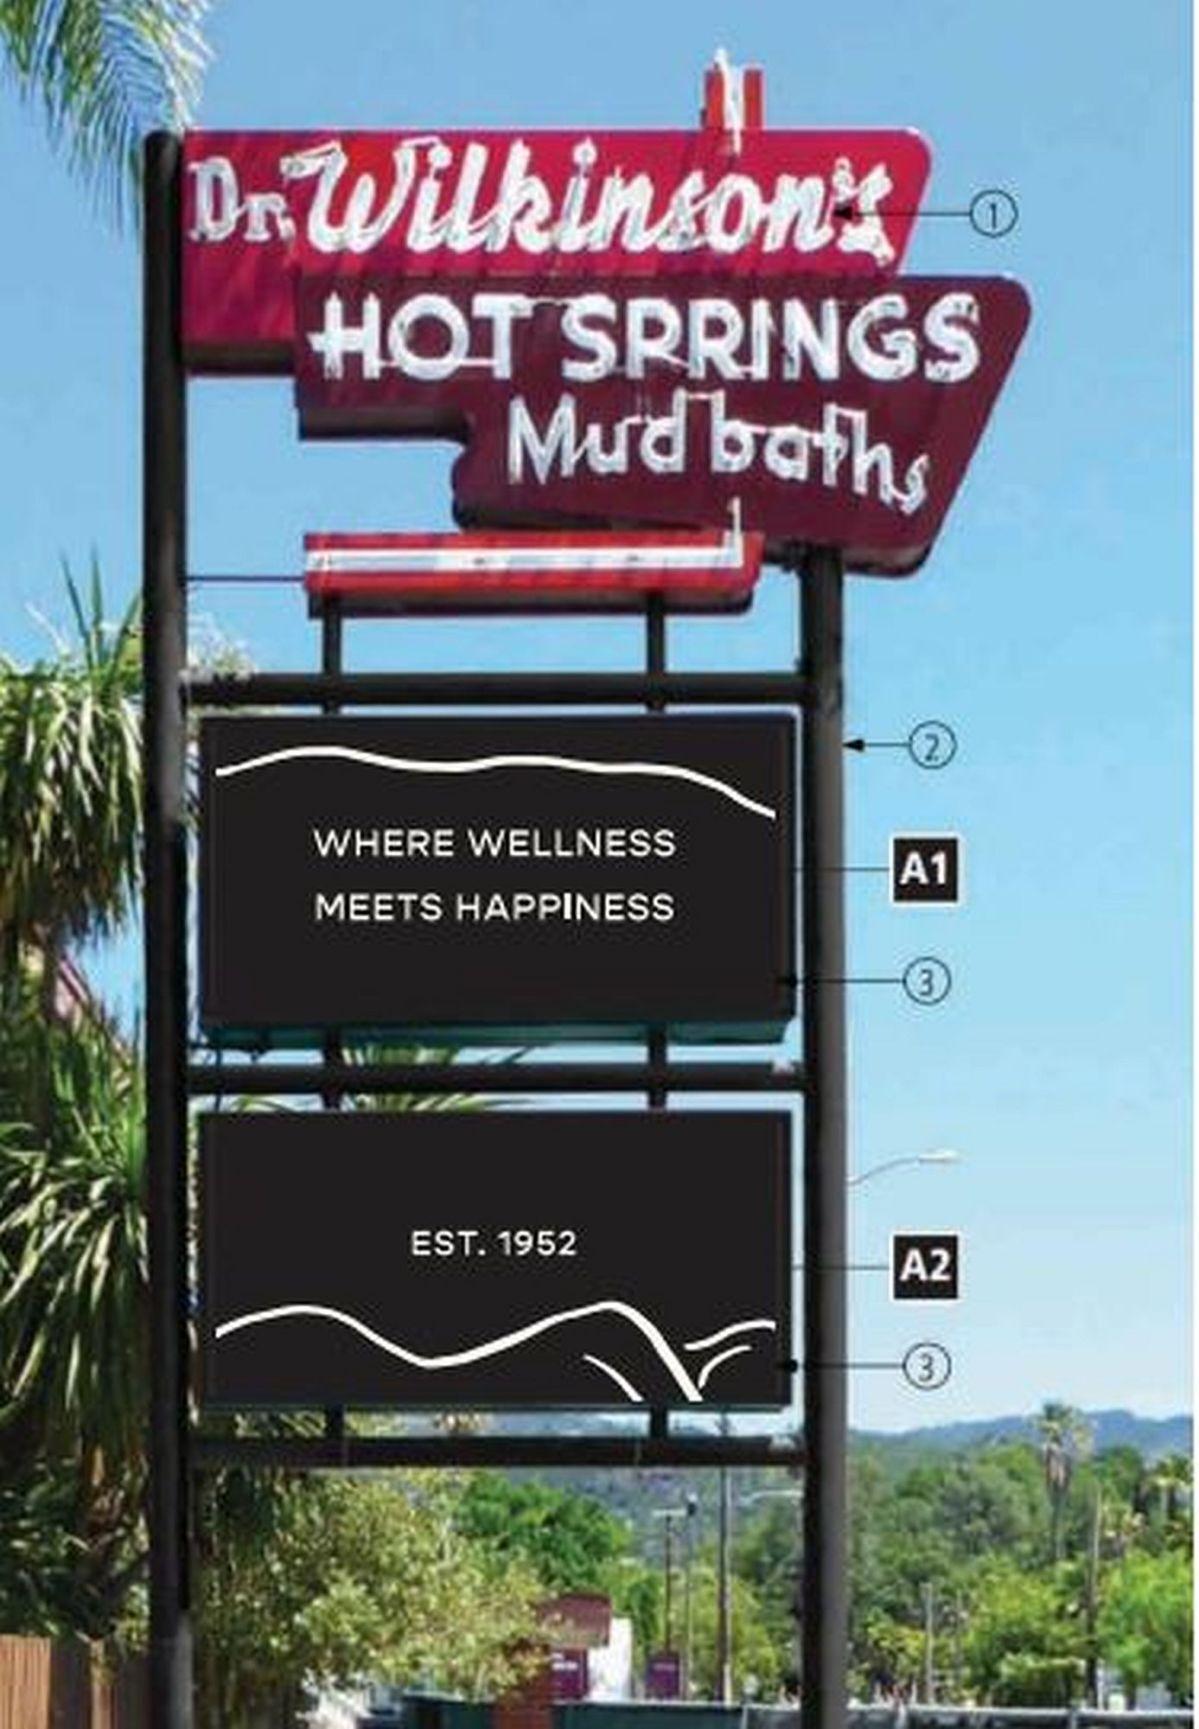 Dr. Wilkinson's Hot Springs Resort